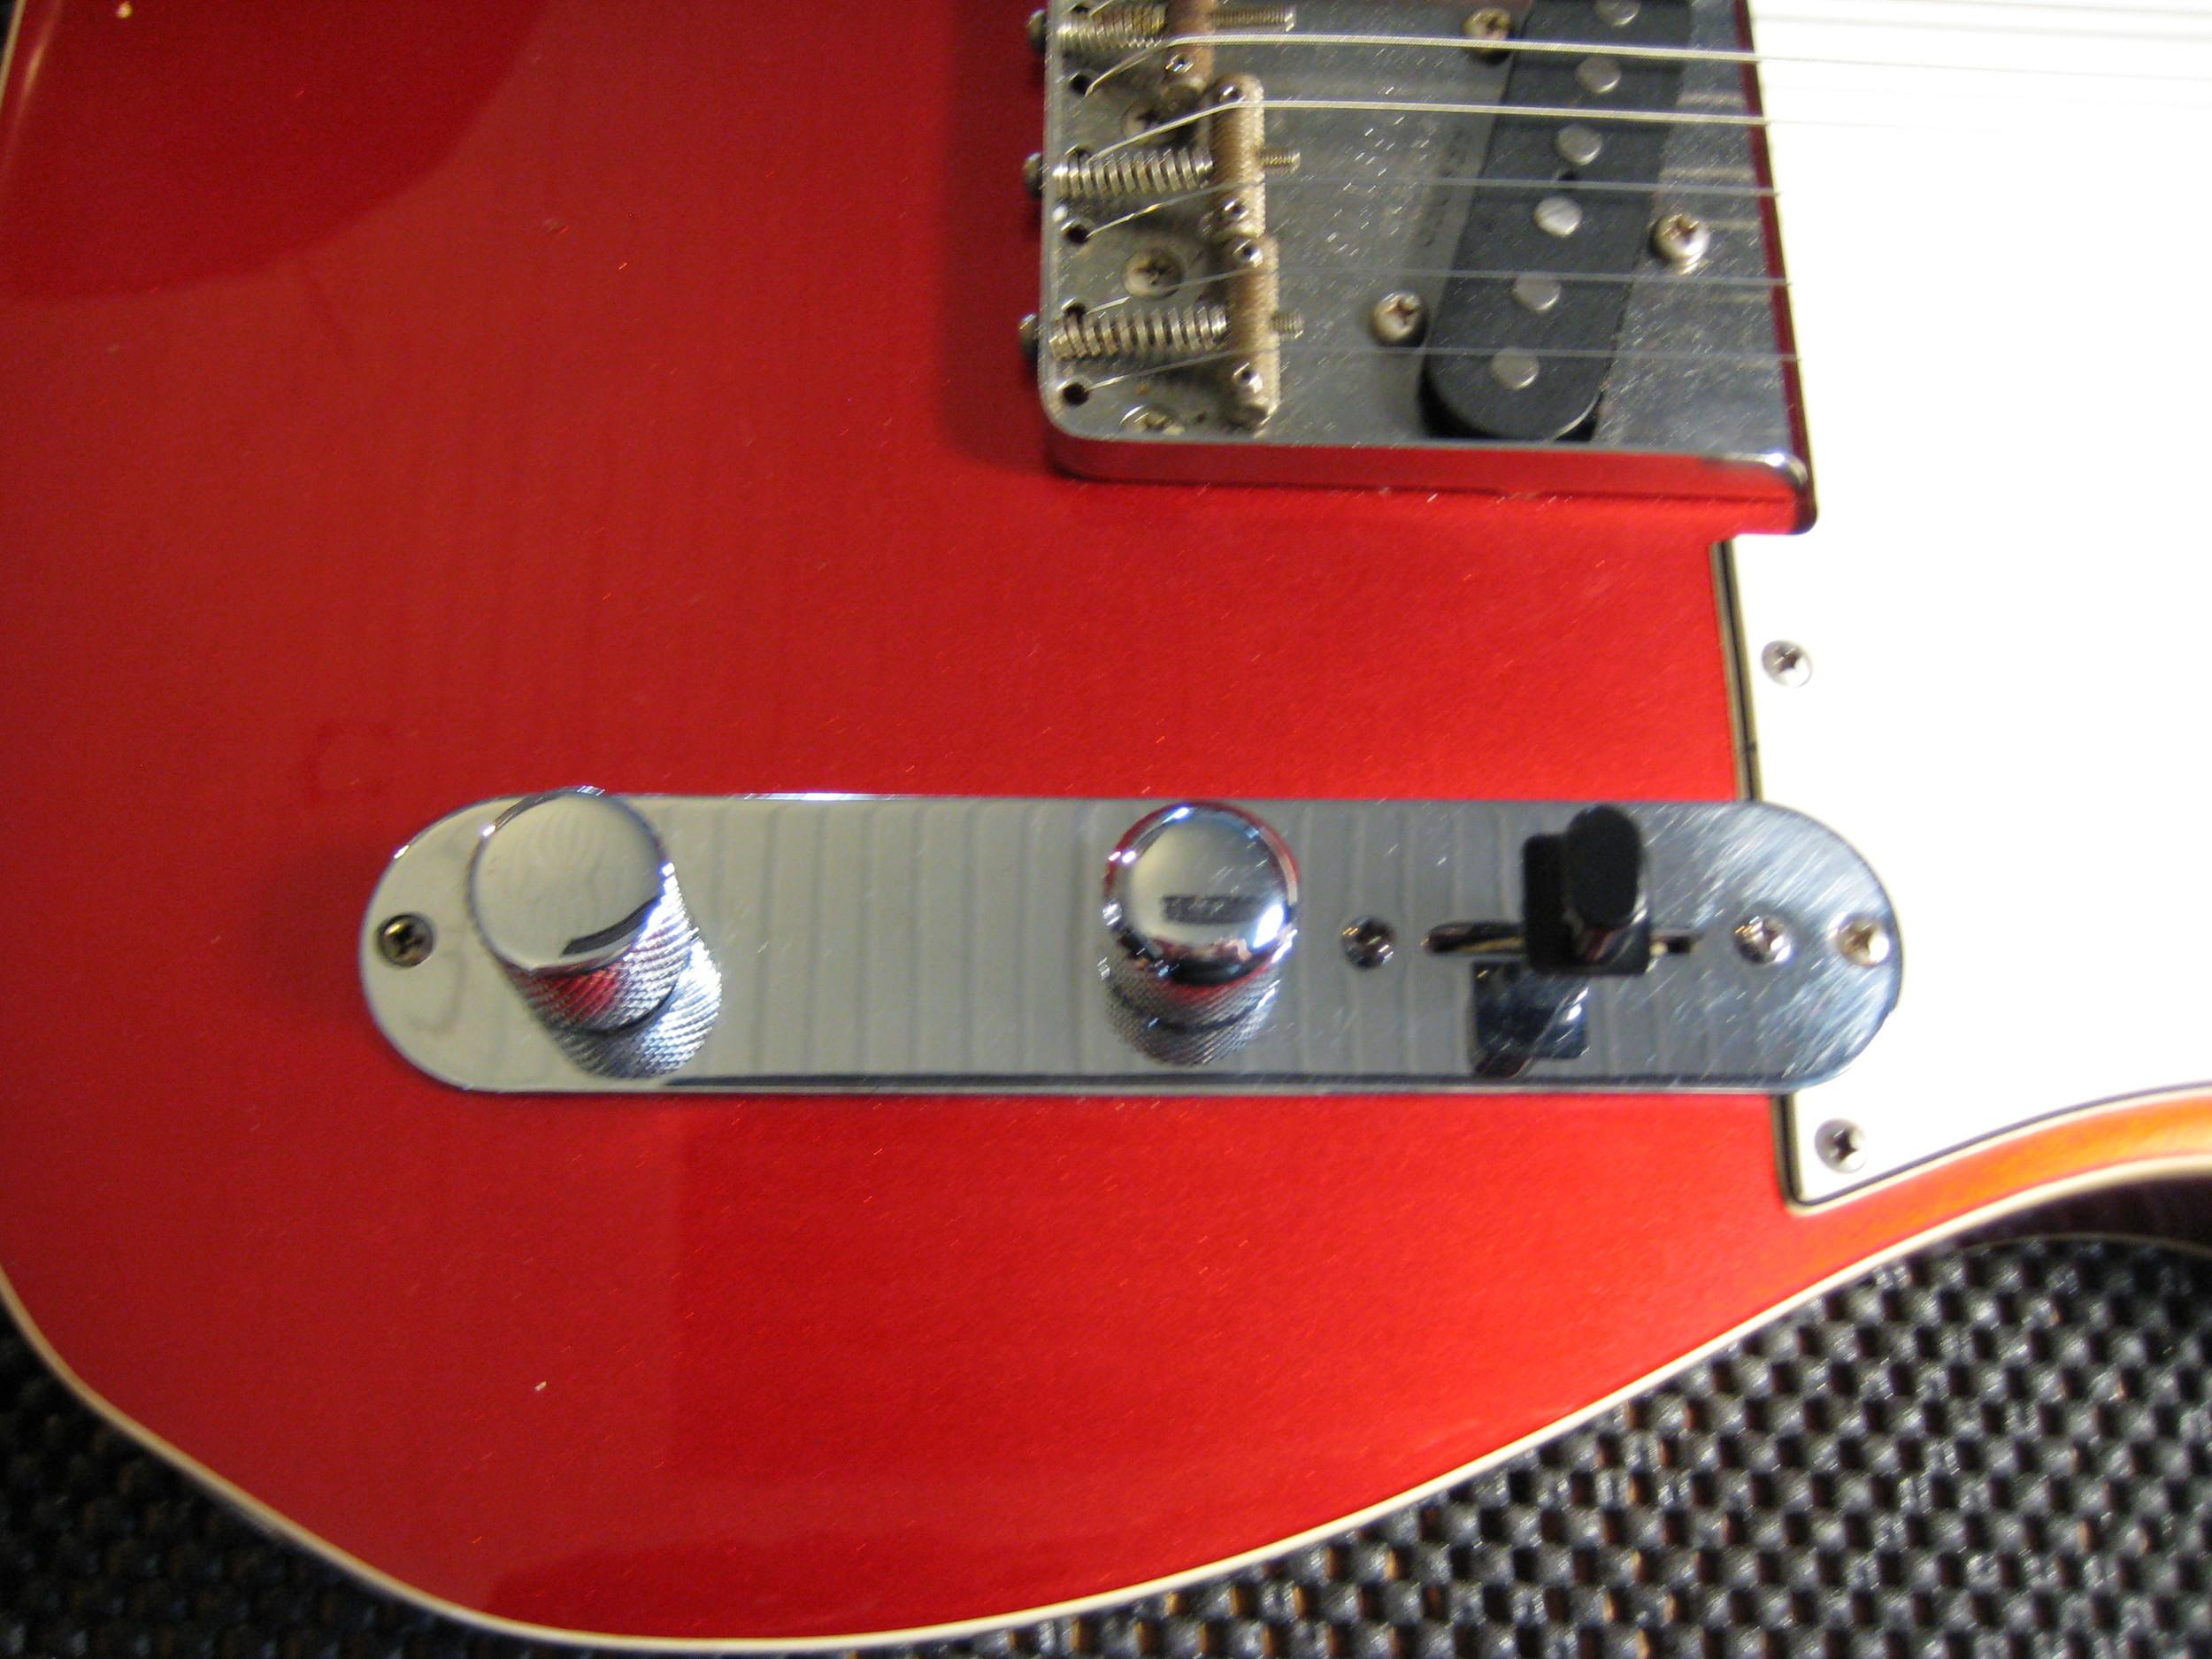 Tone, Volume, Switch (Bridge, B/N Parallel, Neck)